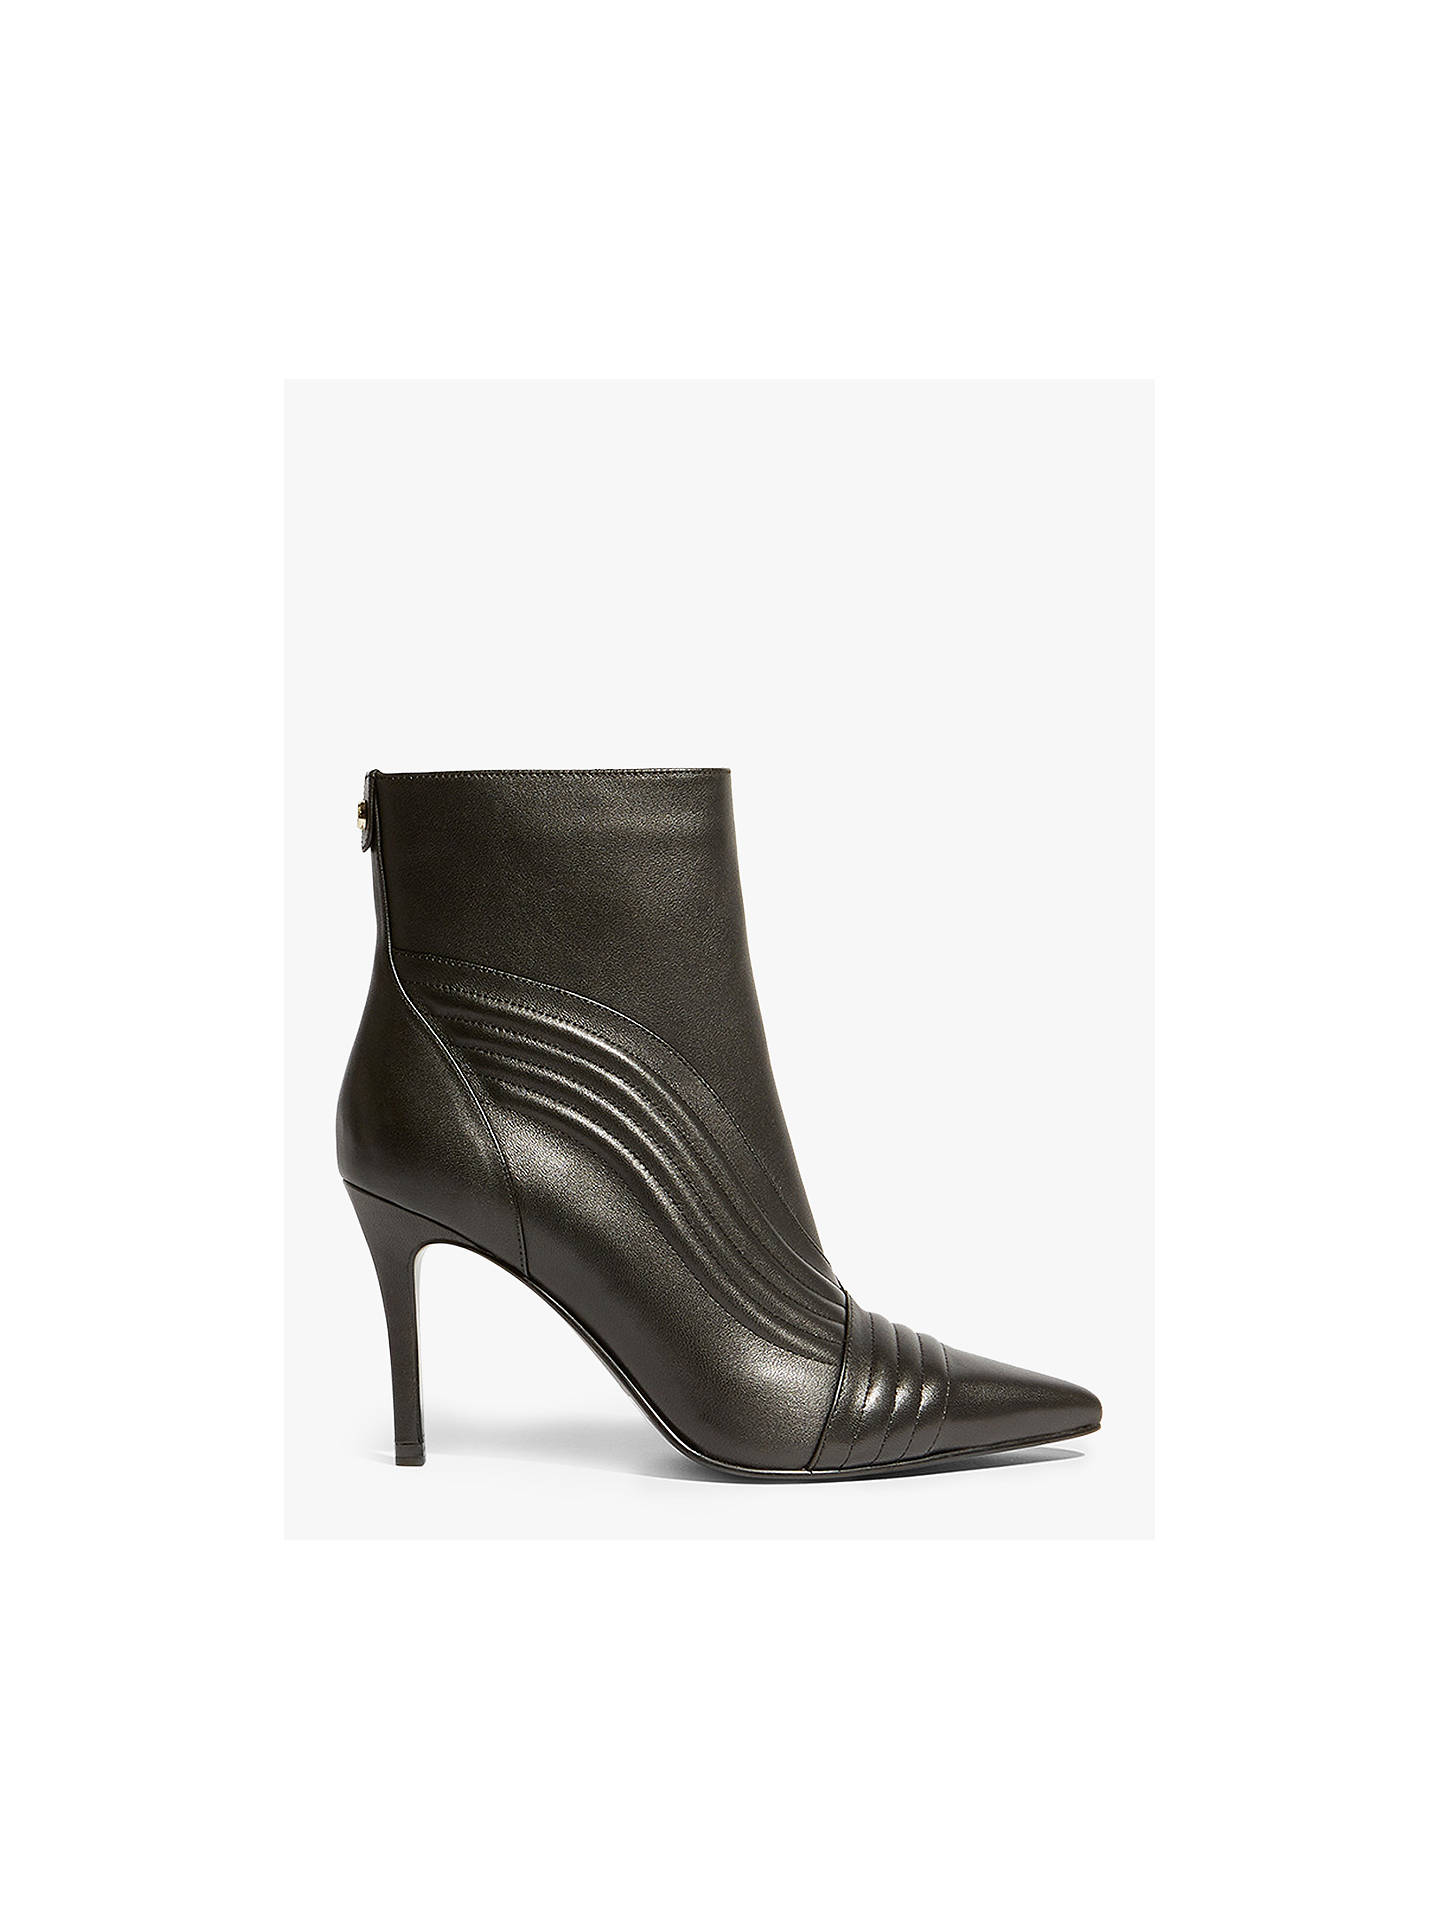 b3a50c8a9790 Buy Karen Millen Ribbed Stiletto Heel Ankle Boots